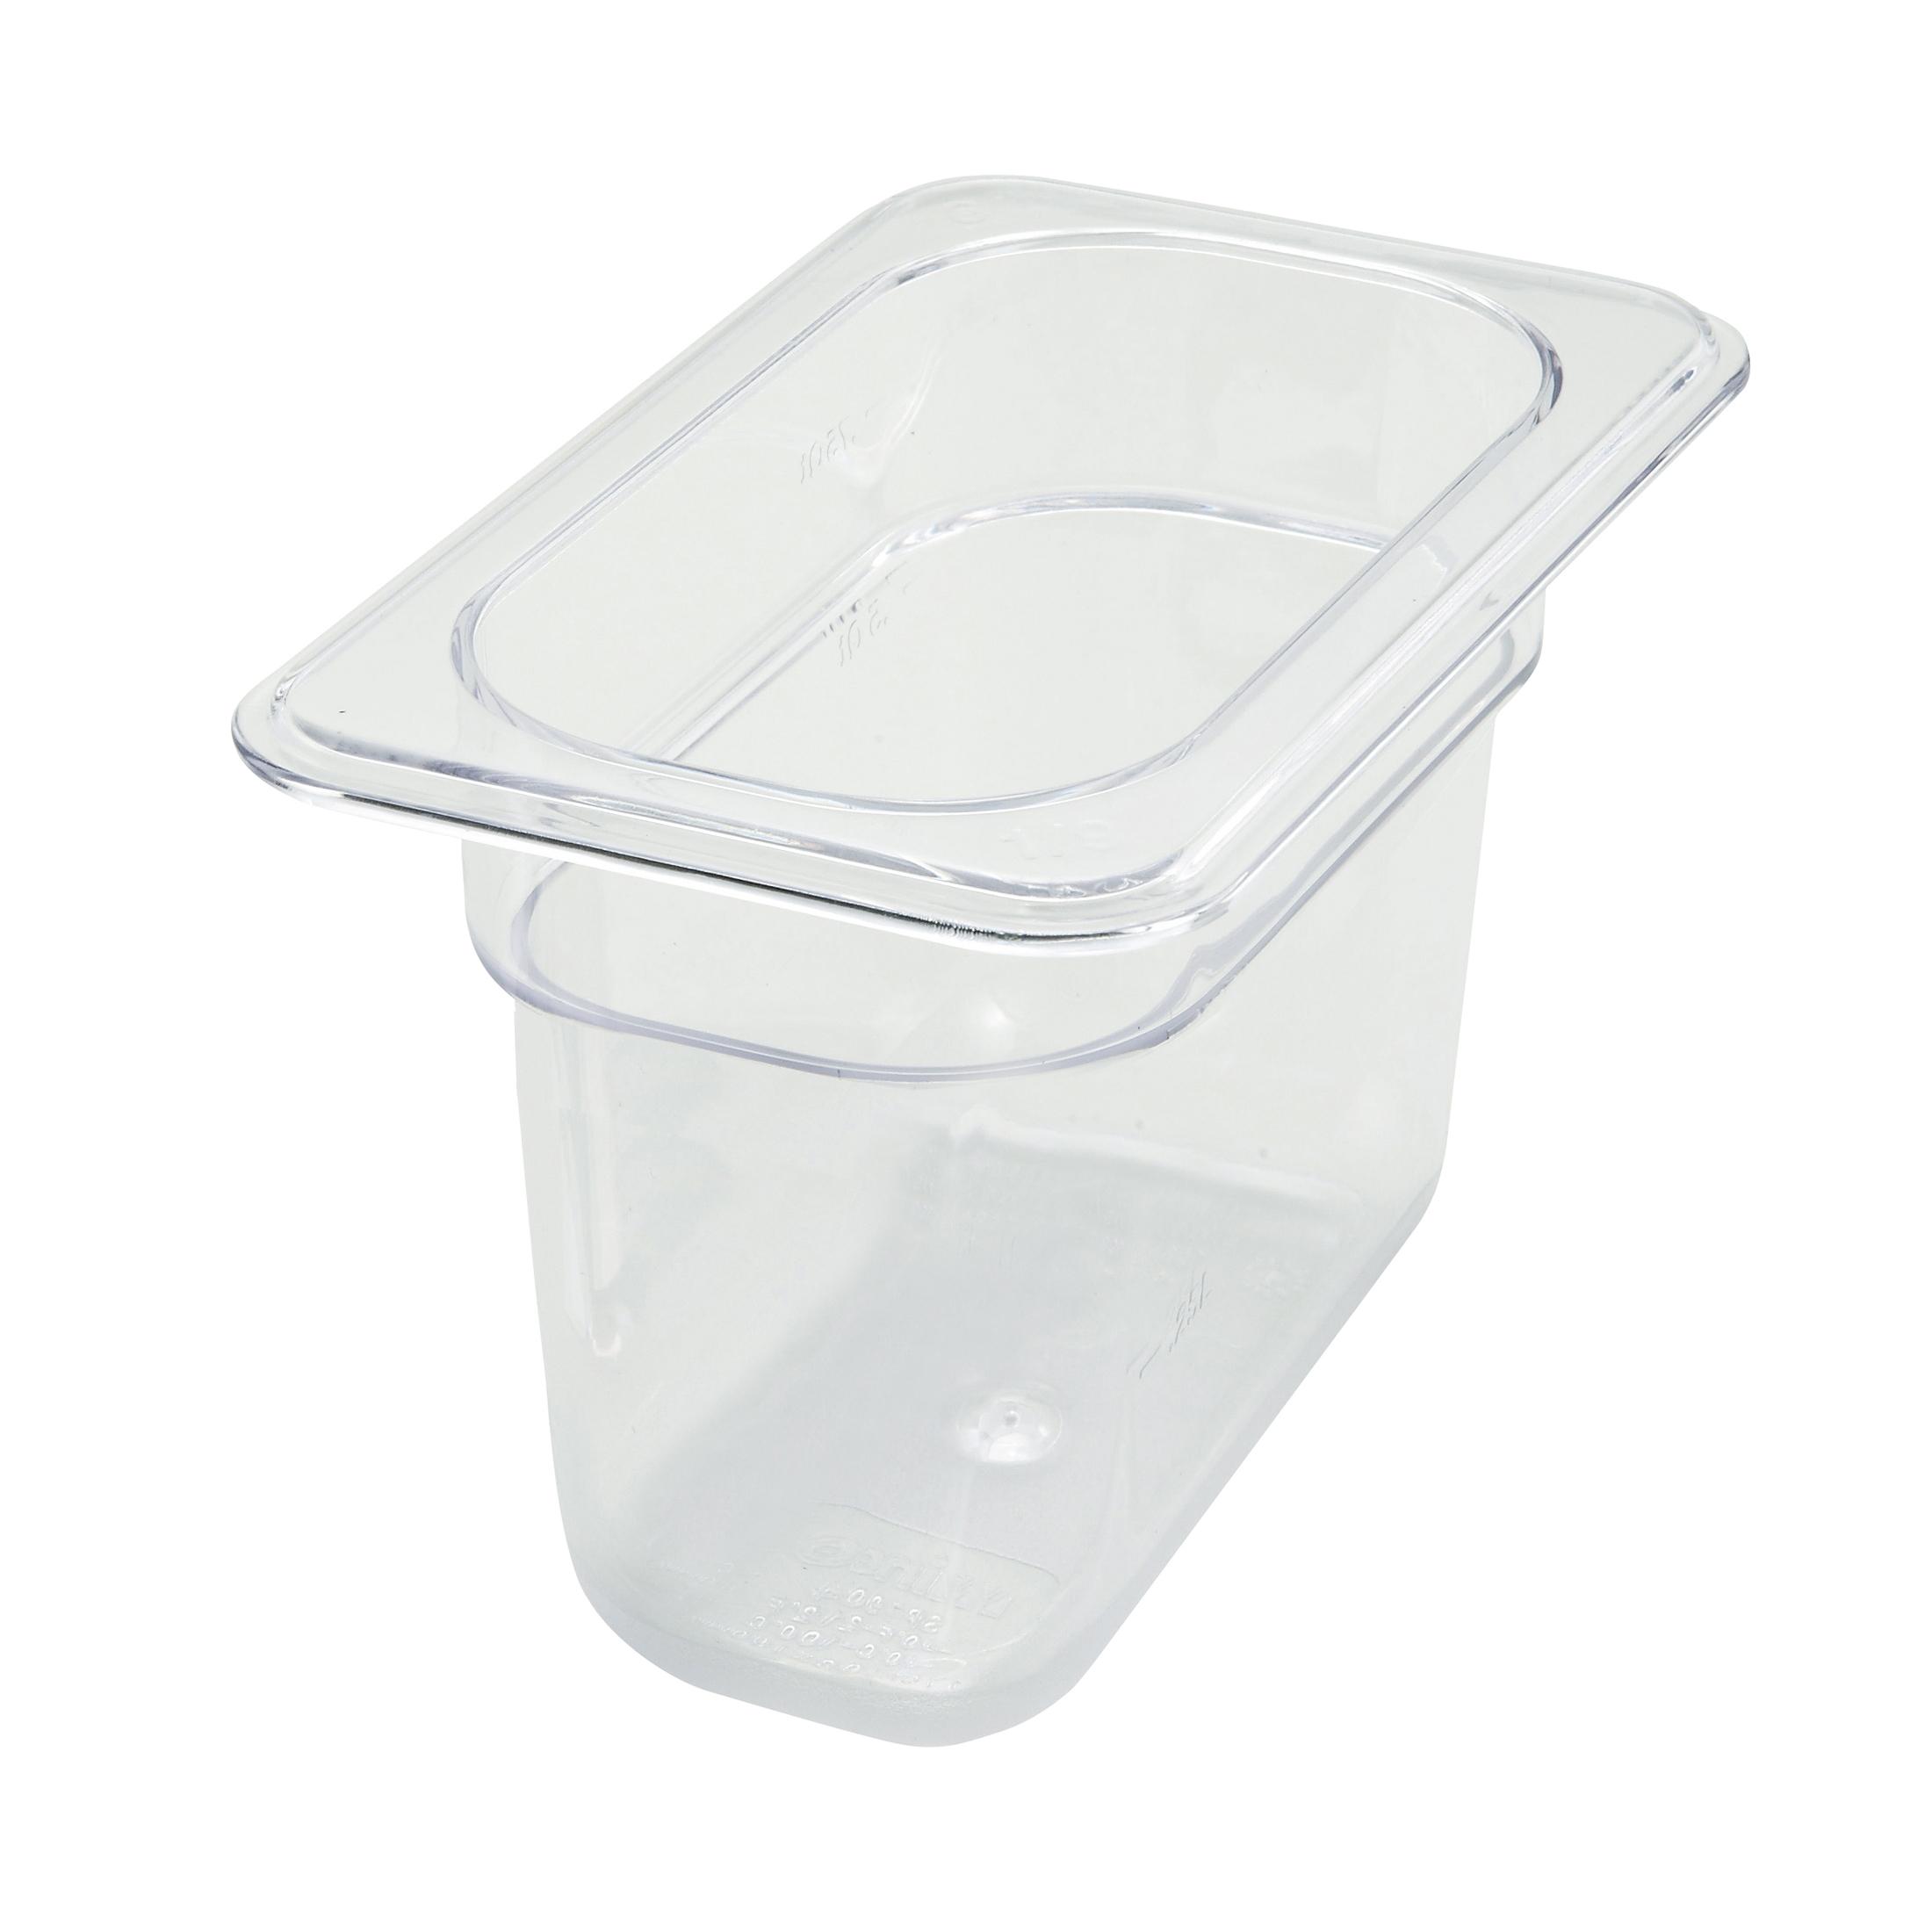 Winco SP7906 food pan, plastic